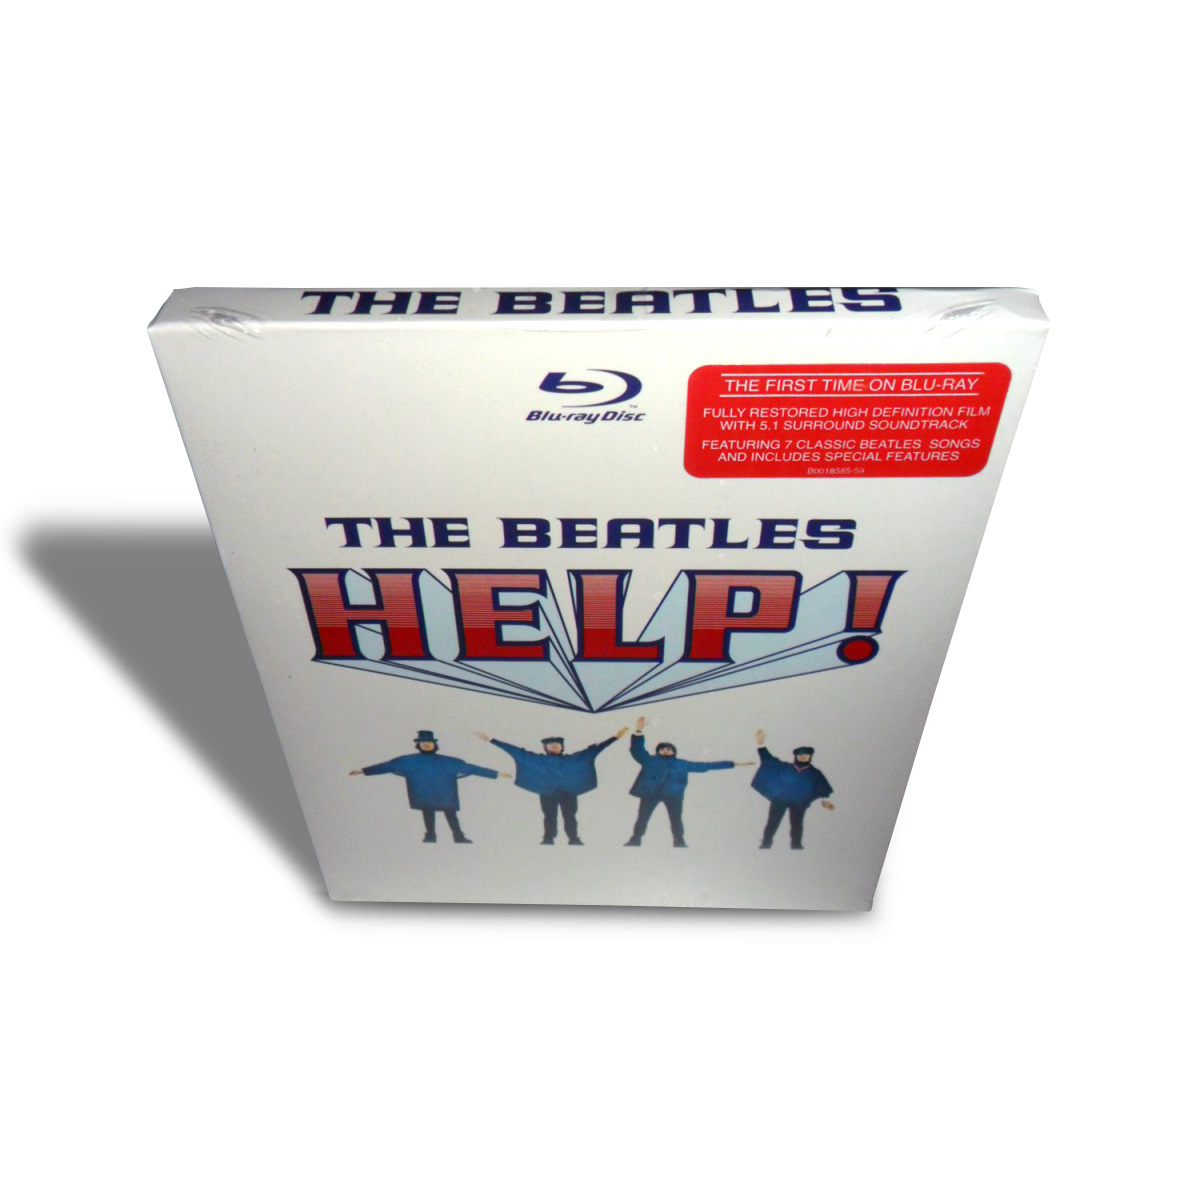 Blu-ray The Beatles Help!